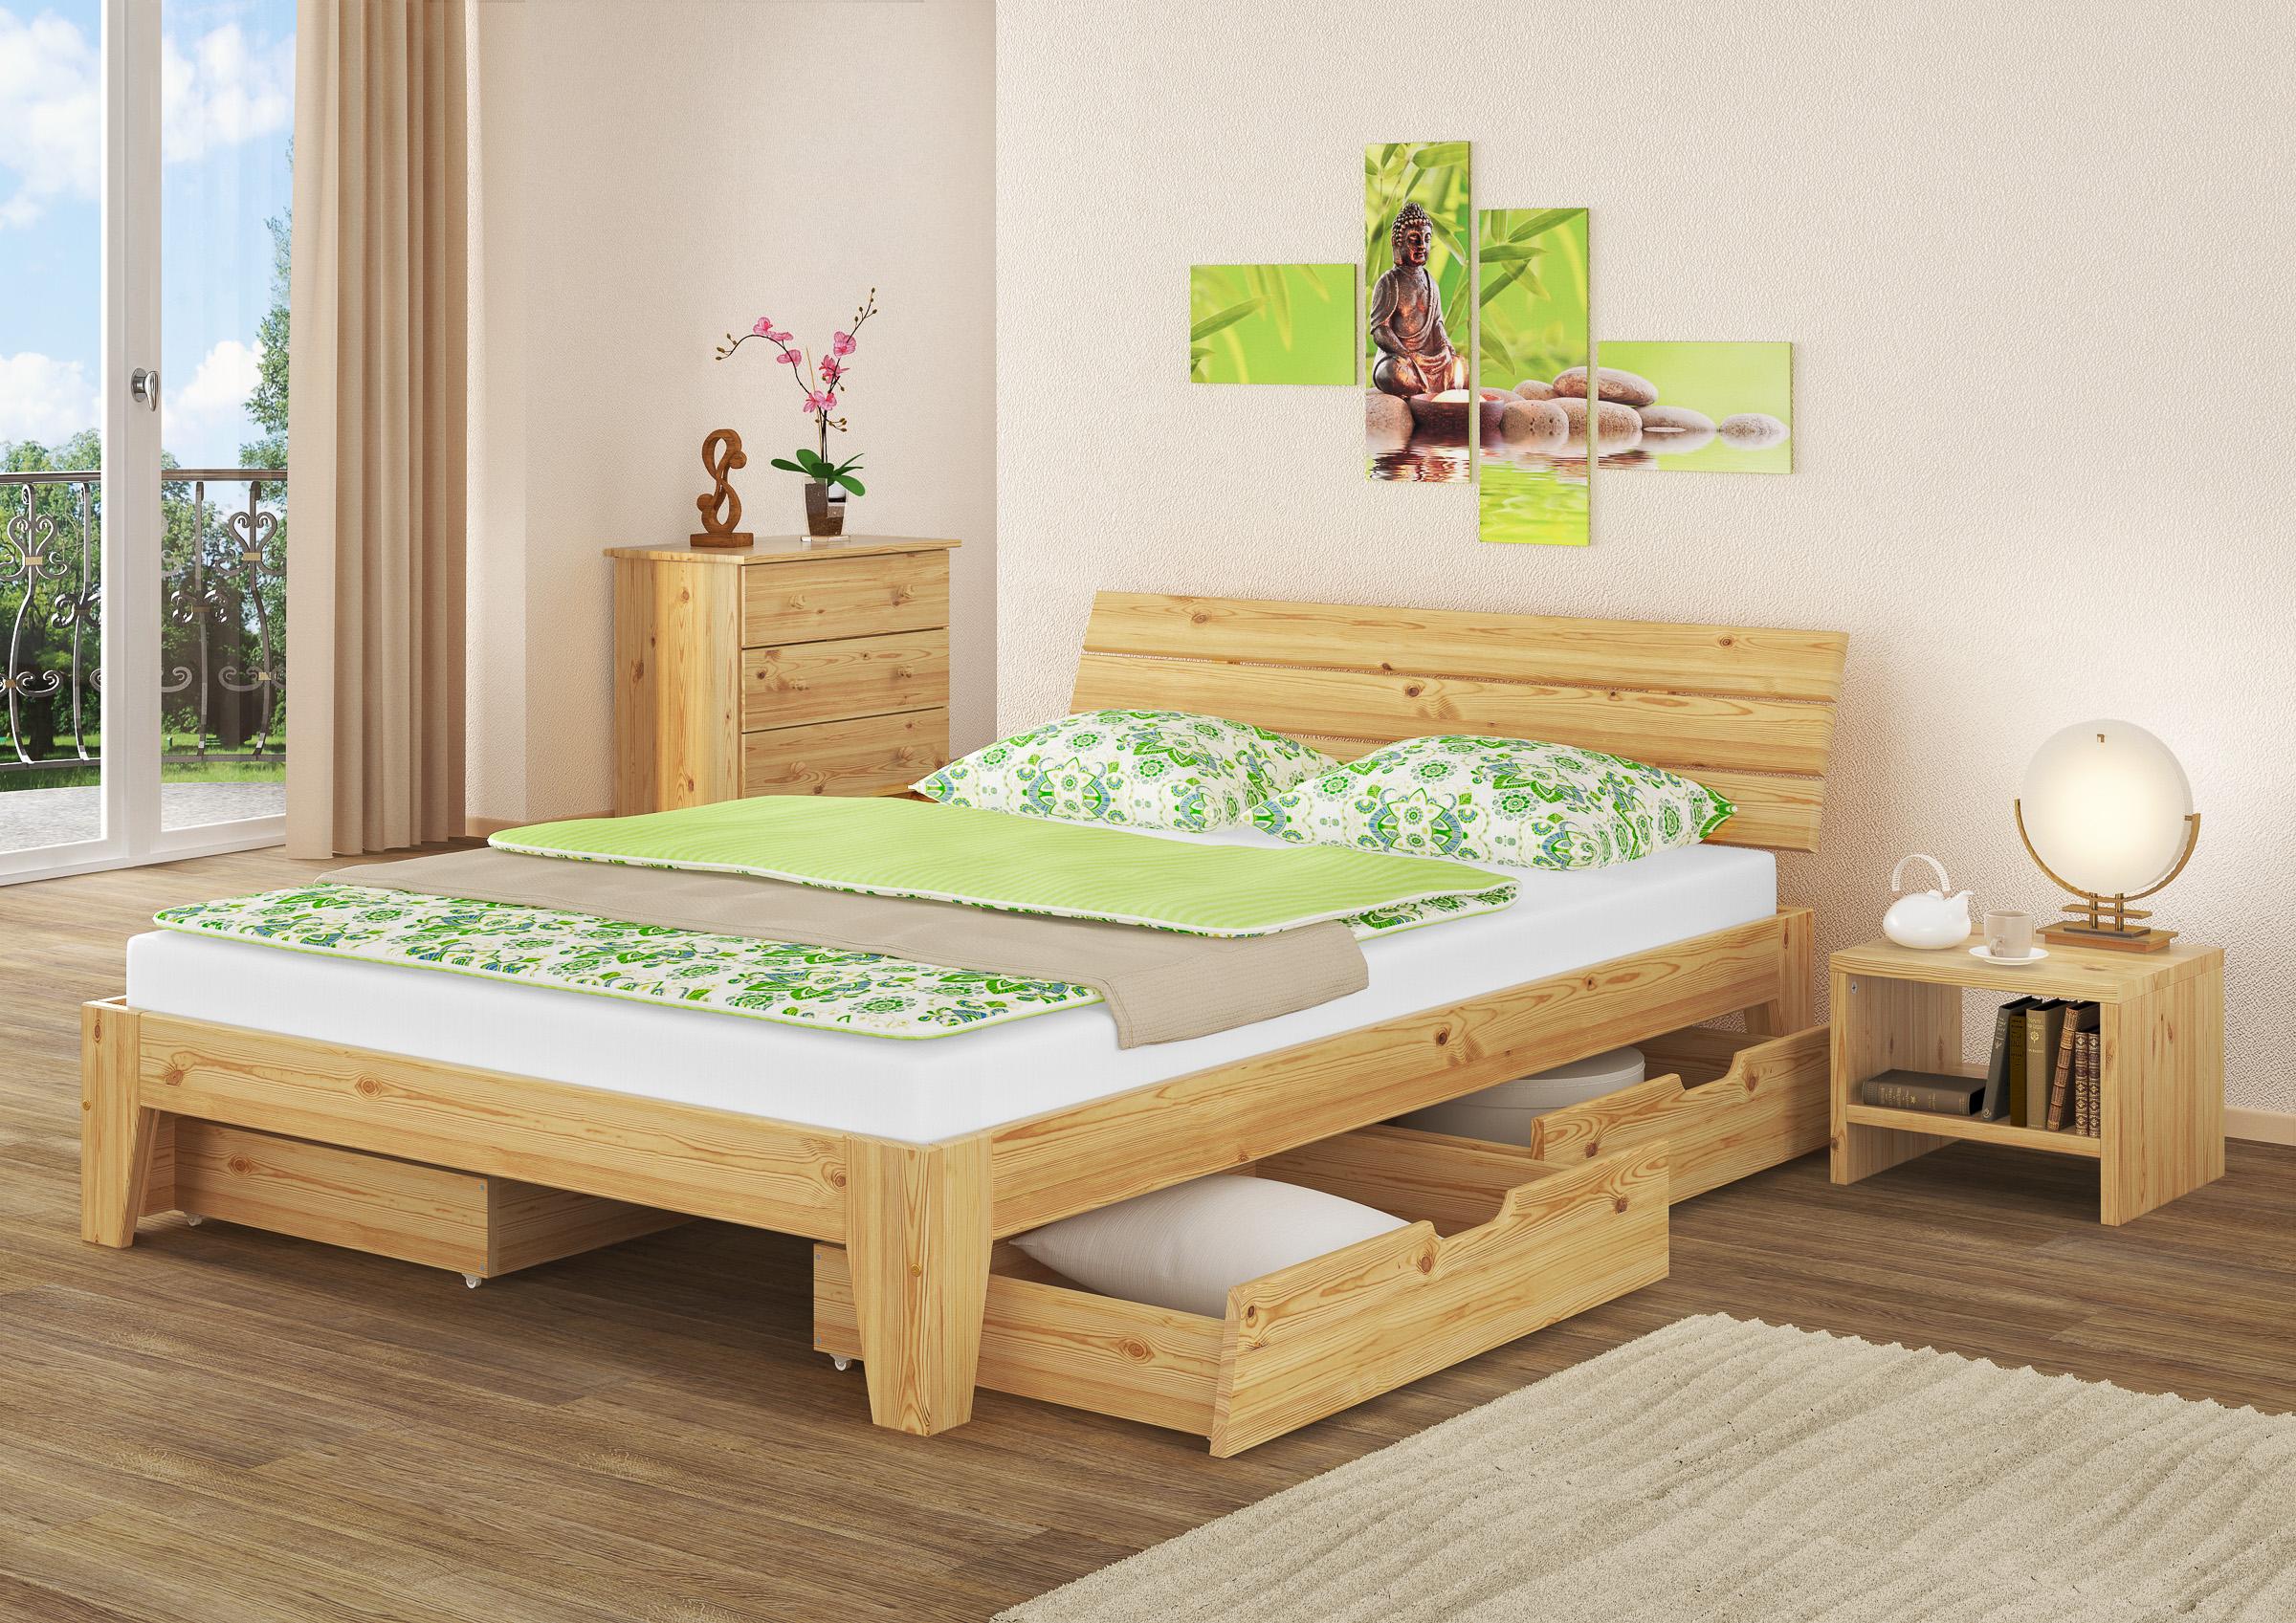 Full Size of Betten Holz Massivholz Bett 140x200 Mit Rollrost Naturholz Aus Bock Esstisch Meise Für Teenager Schlafzimmer Komplett 160x200 Holzfliesen Bad Balinesische Bett Betten Holz